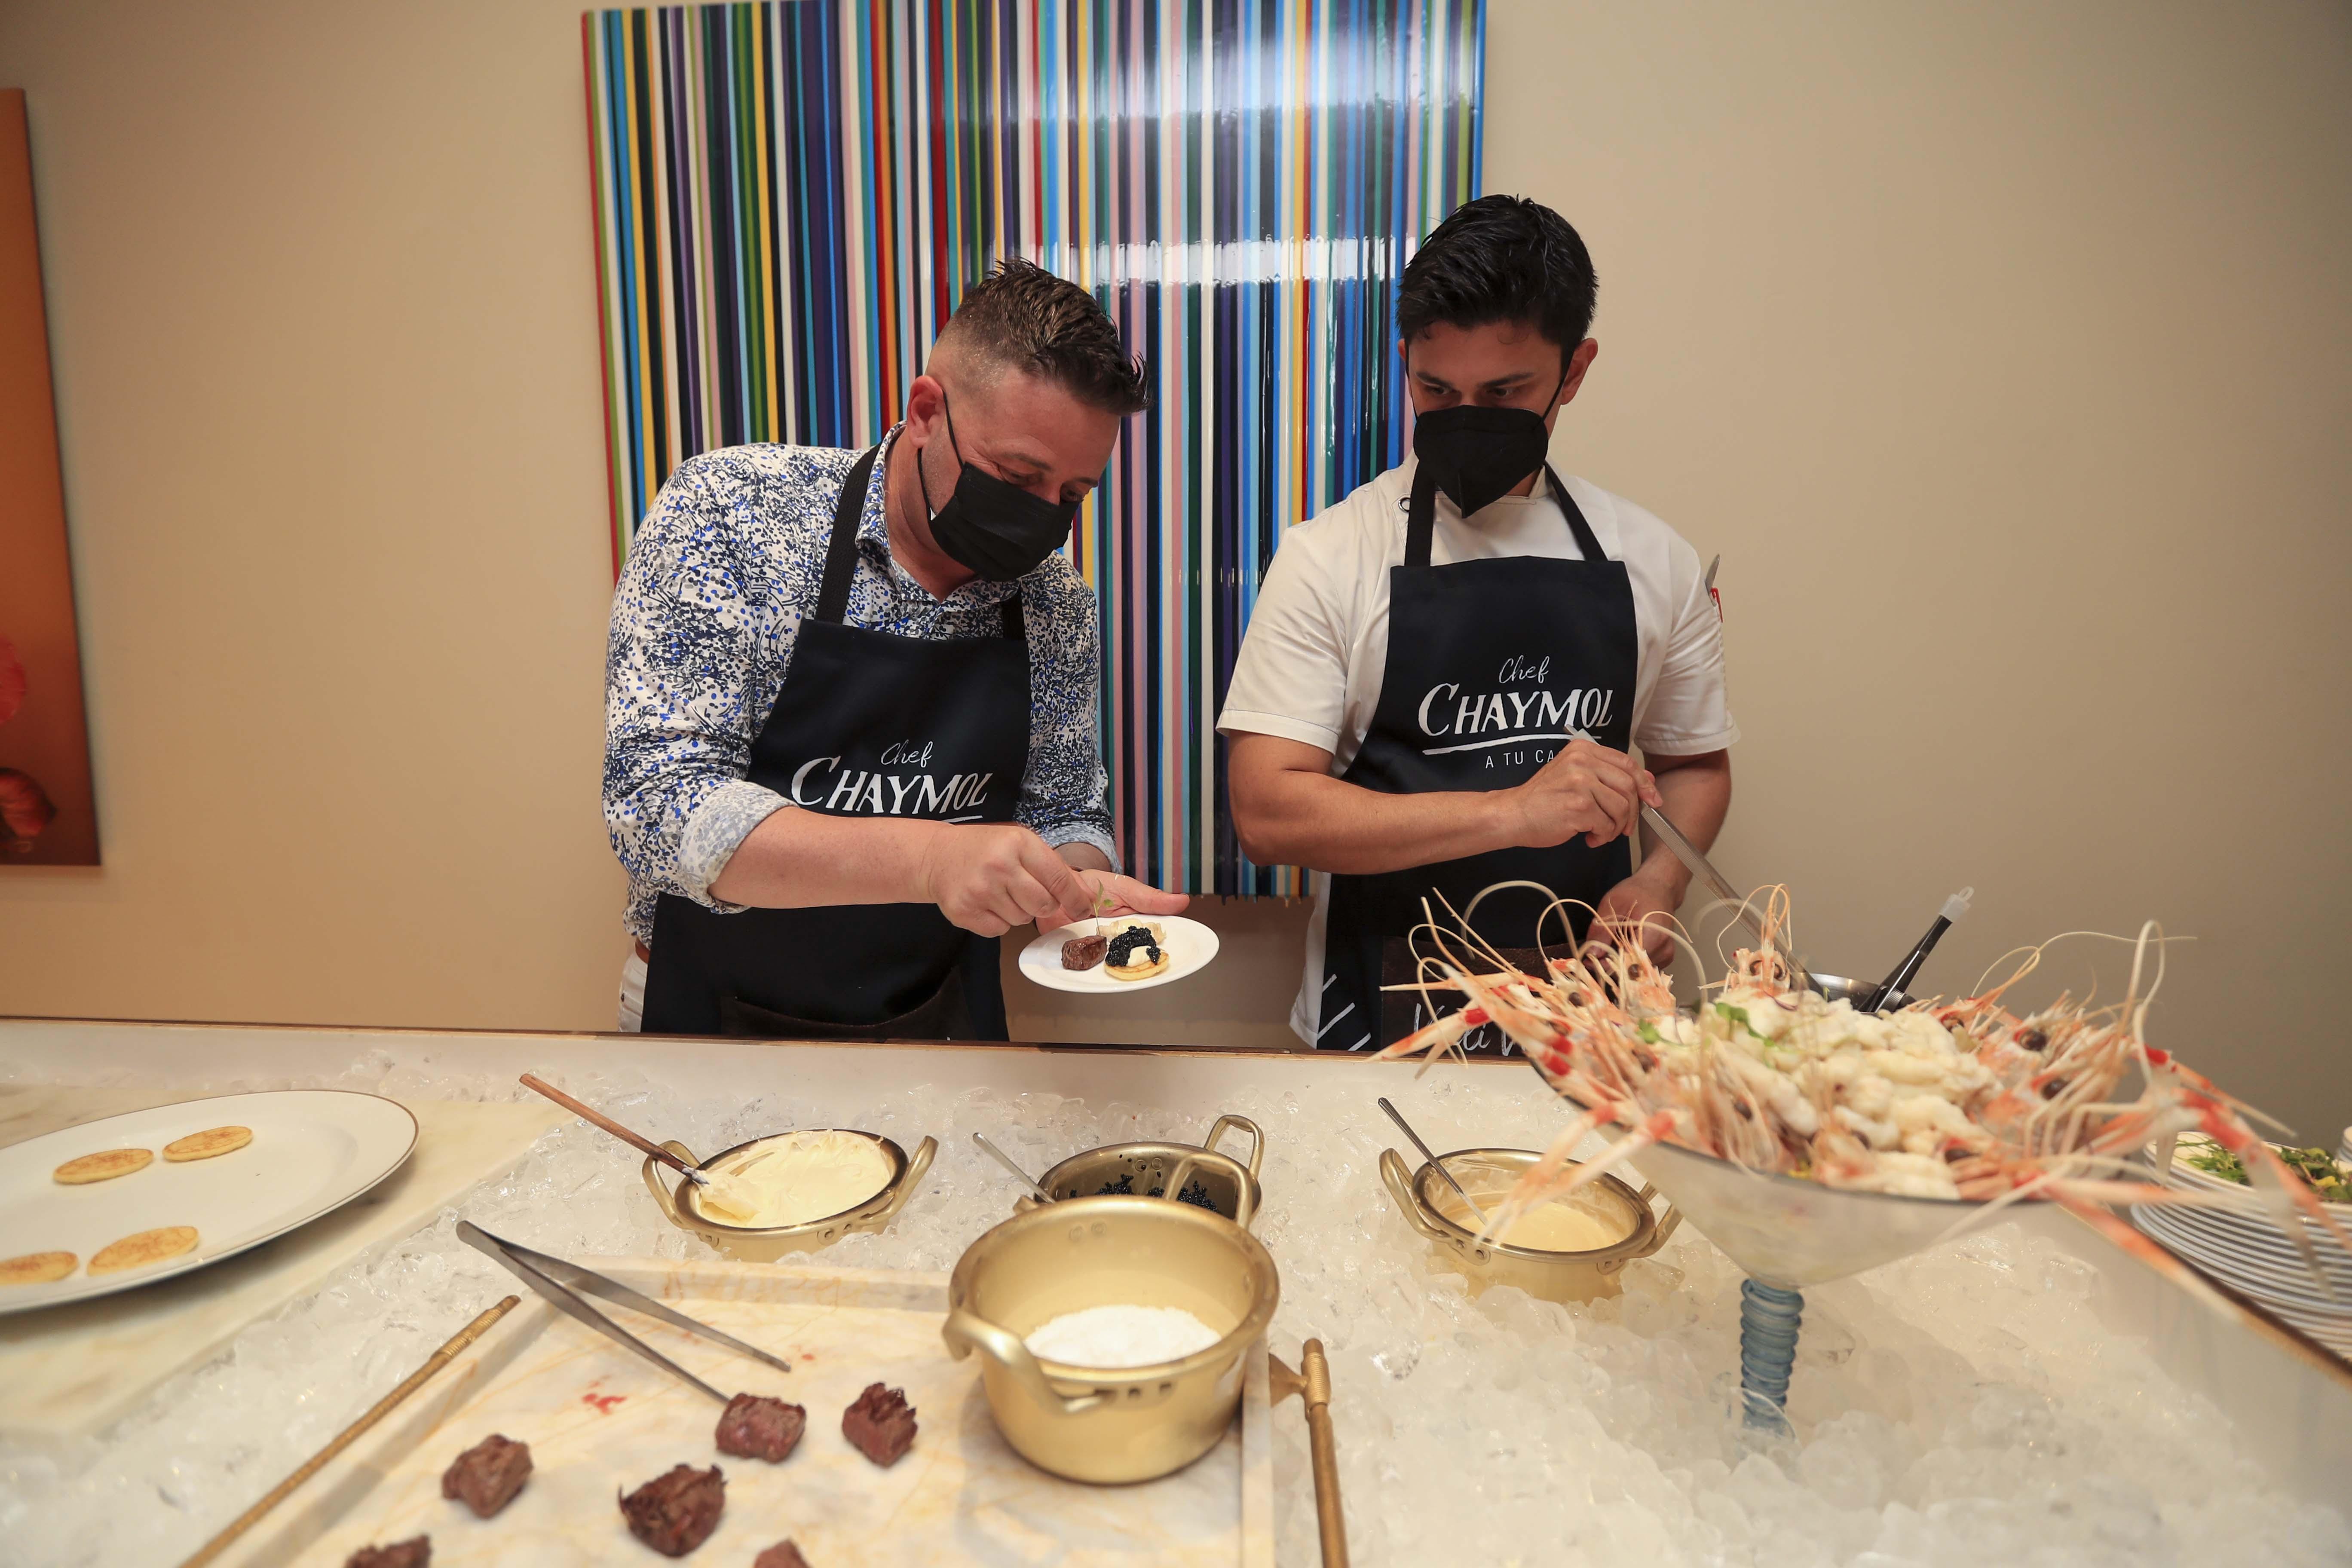 La experiencia gastronómica estuvo a cargo del chef francés, David Chaymol. (Wanda Liz Vega)